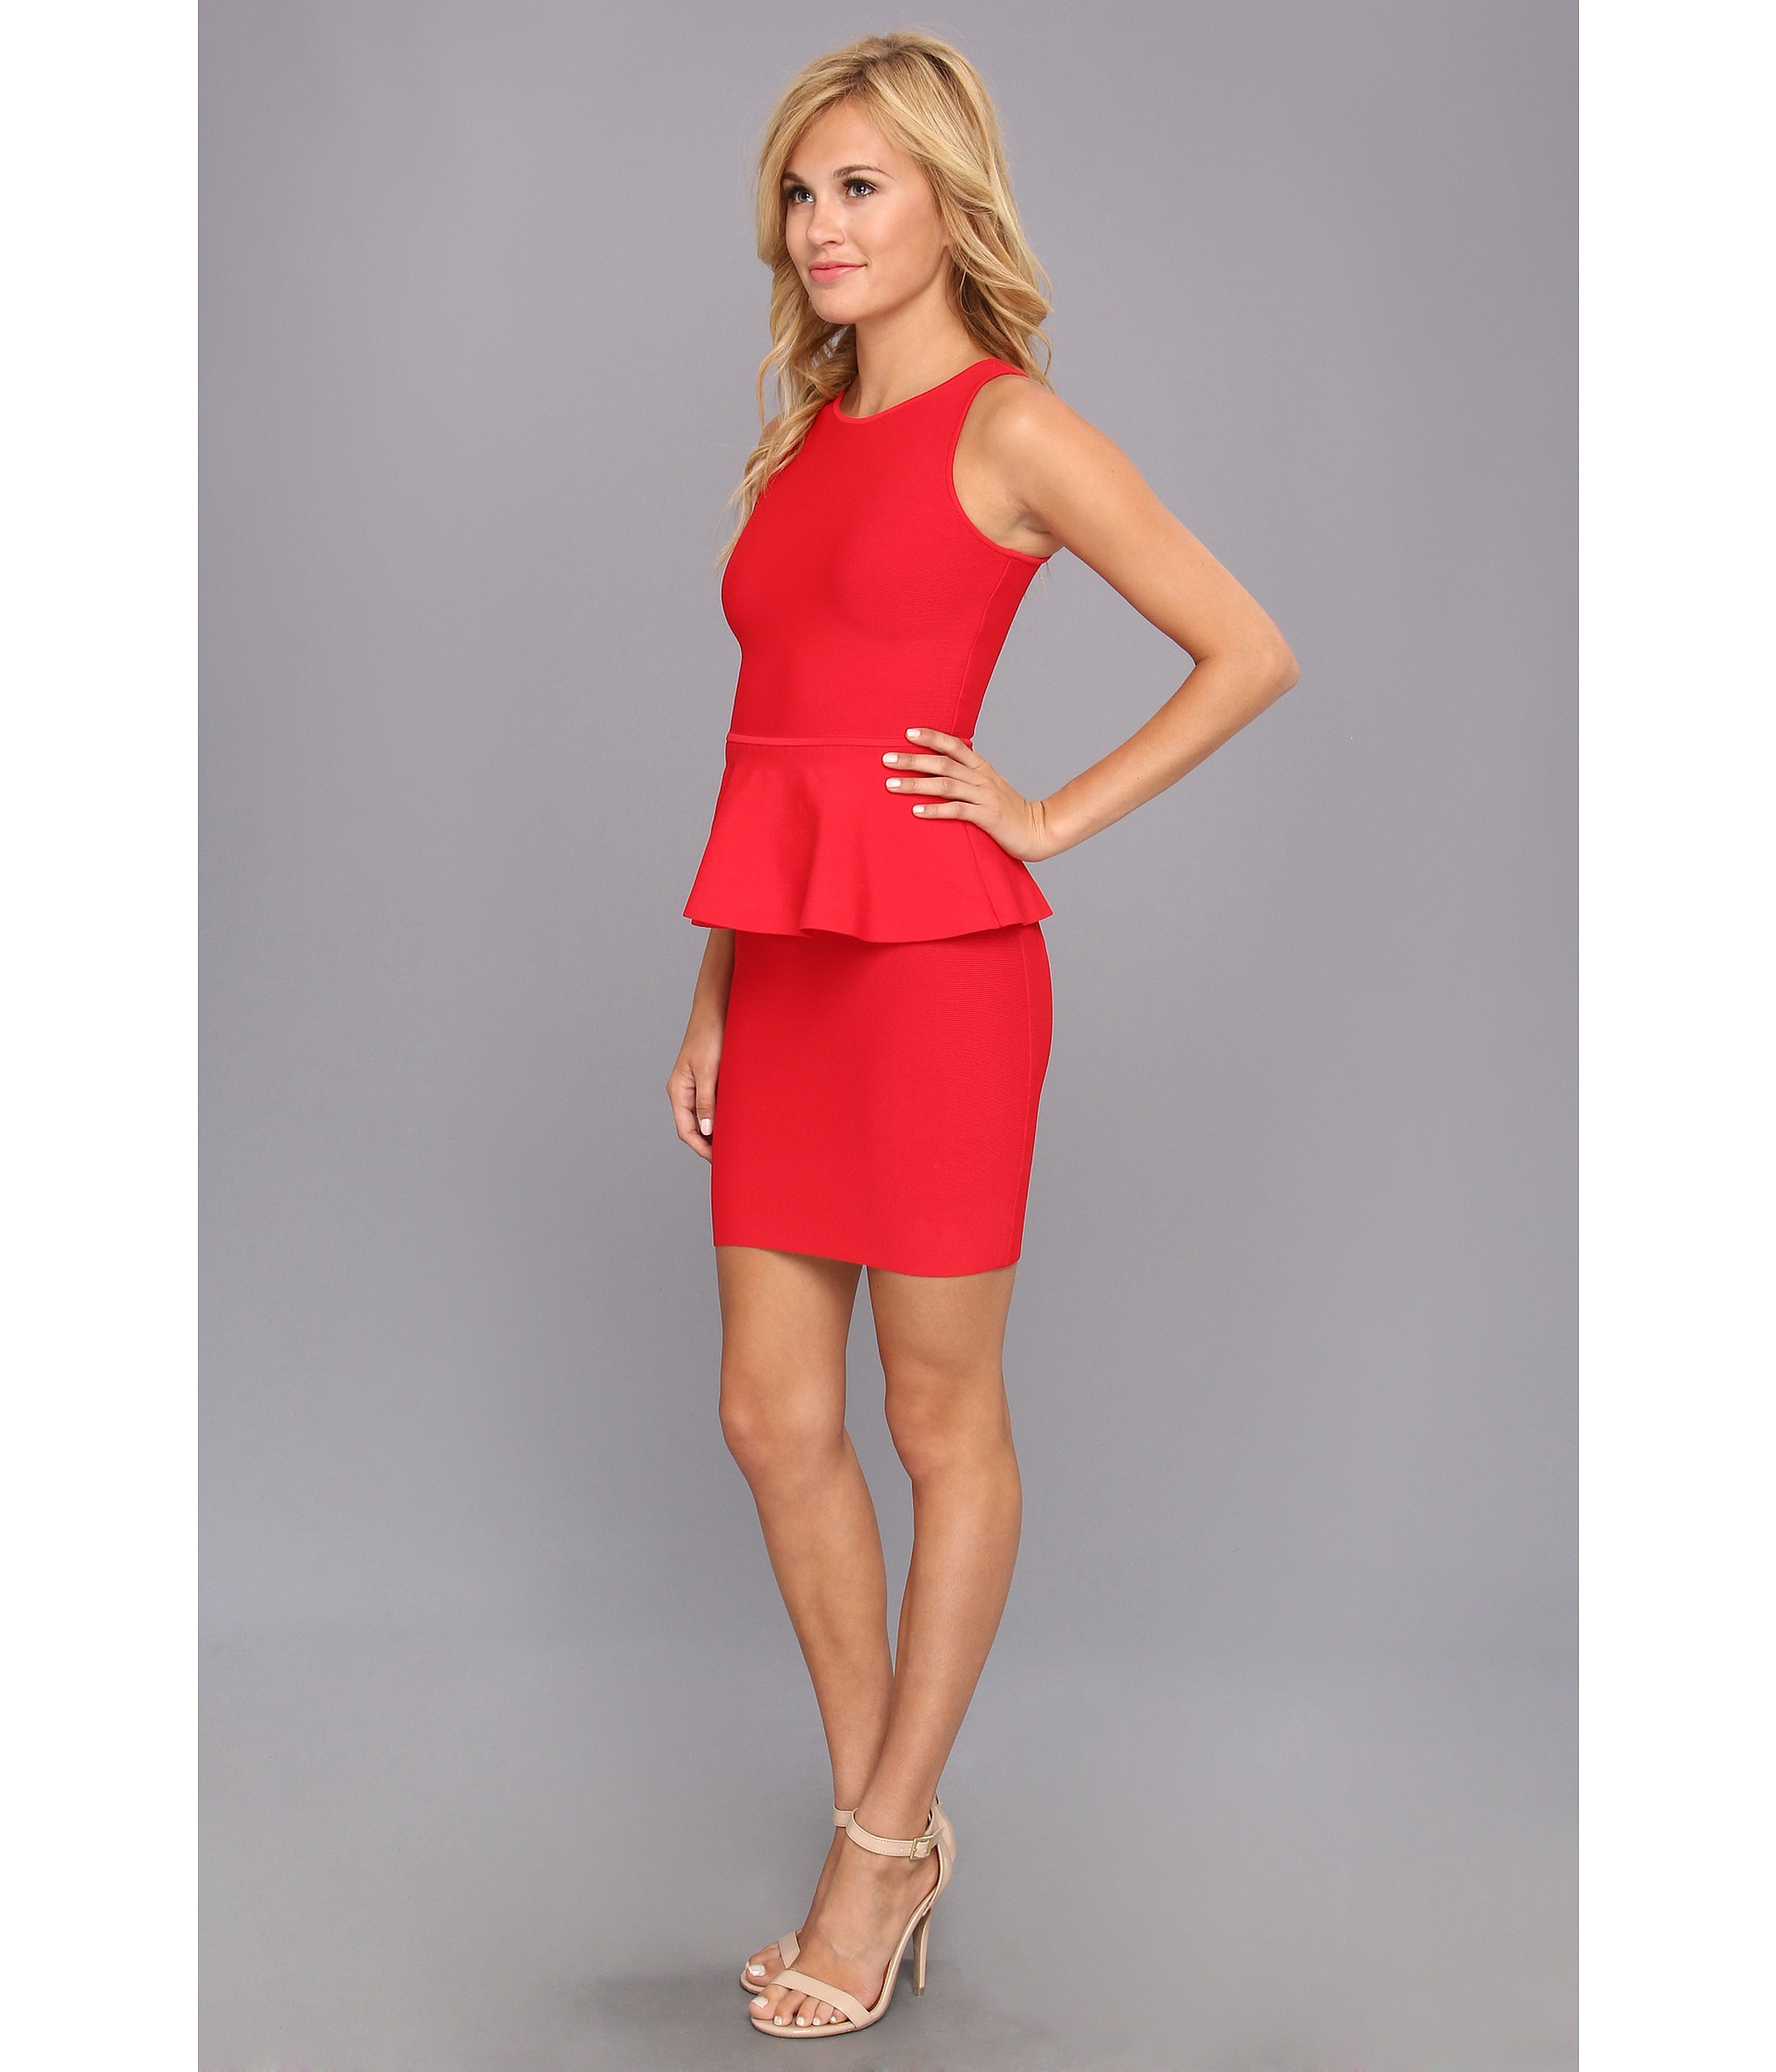 Lyst - Bcbgmaxazria Francis Peplum Dress in Red